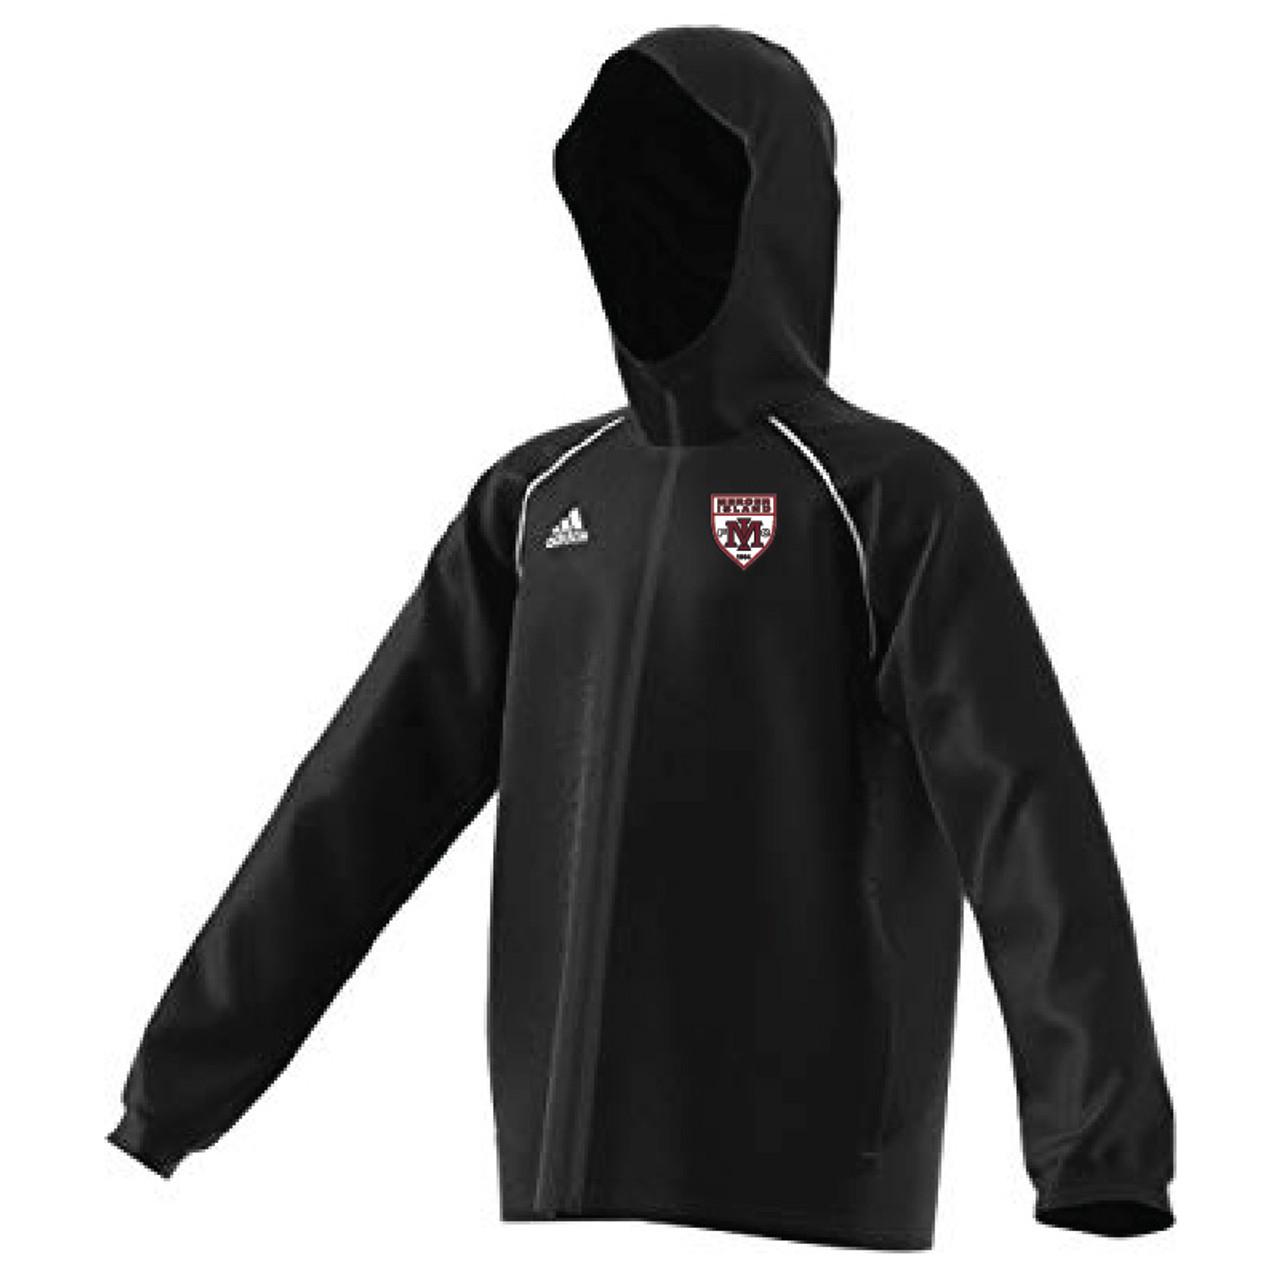 b769db4dd103 adidas Core 18 Rain Jacket - MIFC - Soccer City